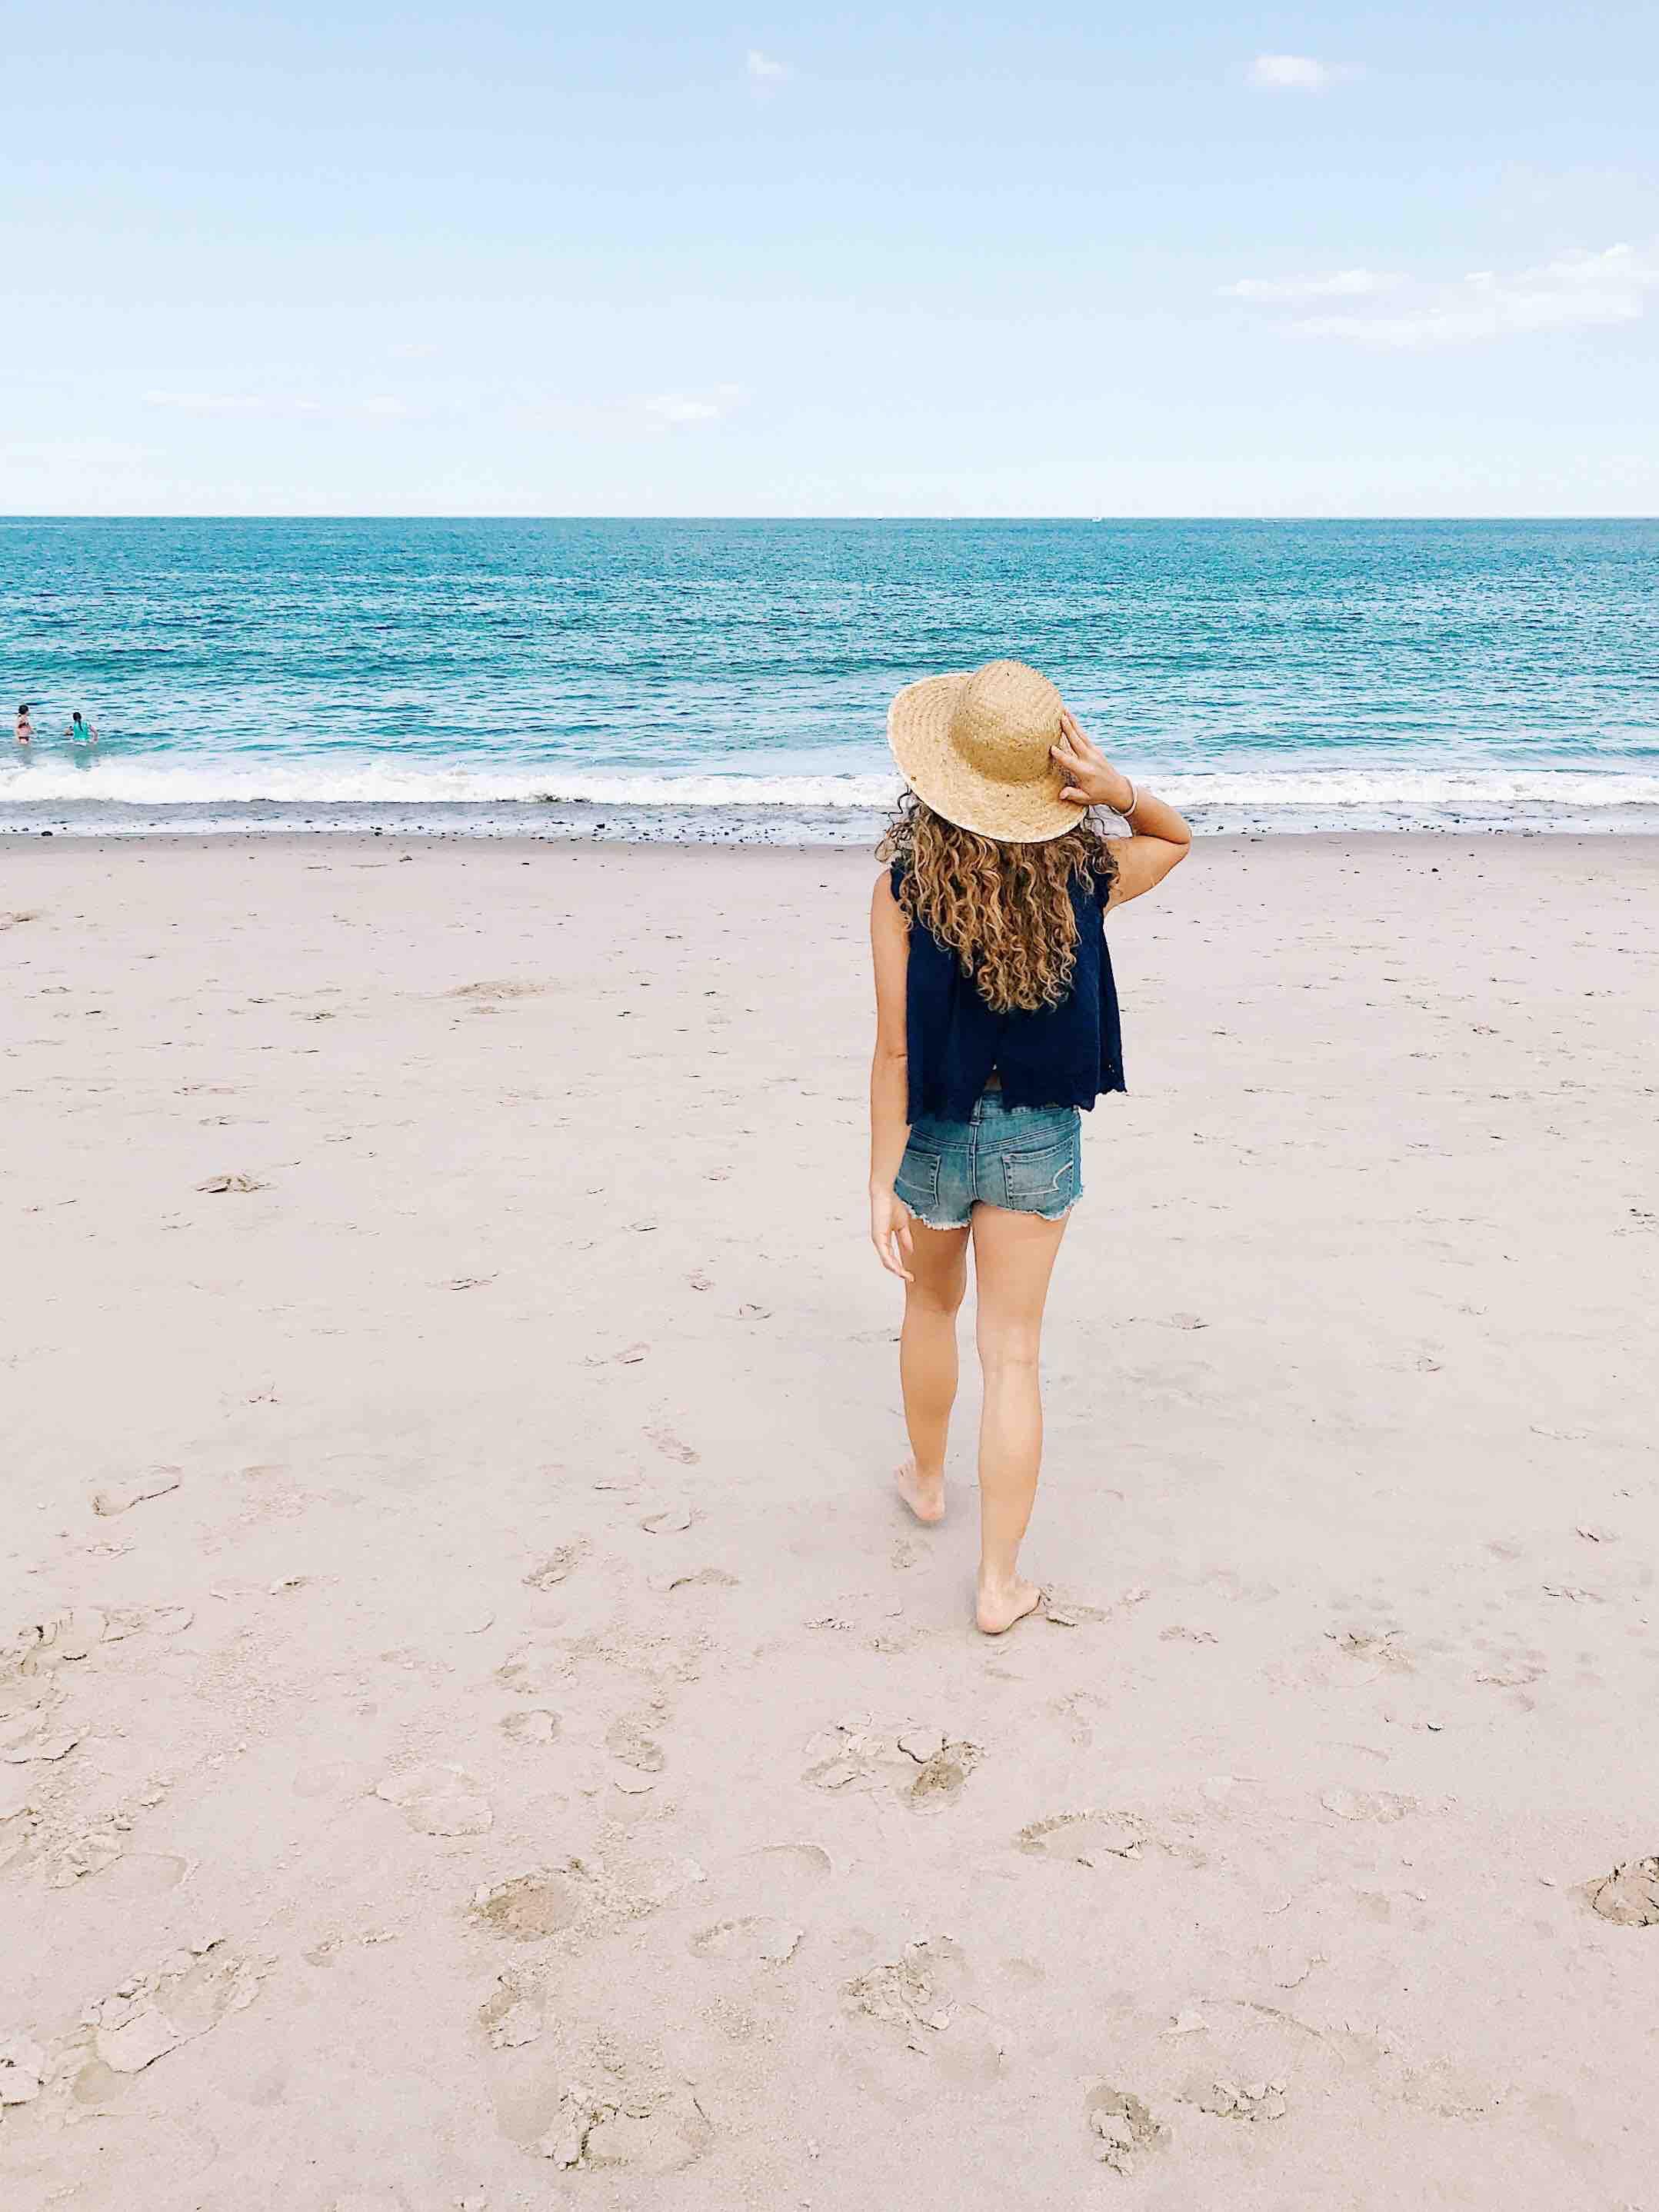 The Best Reef Safe, Biodegradable Sunscreen For Summer Fun